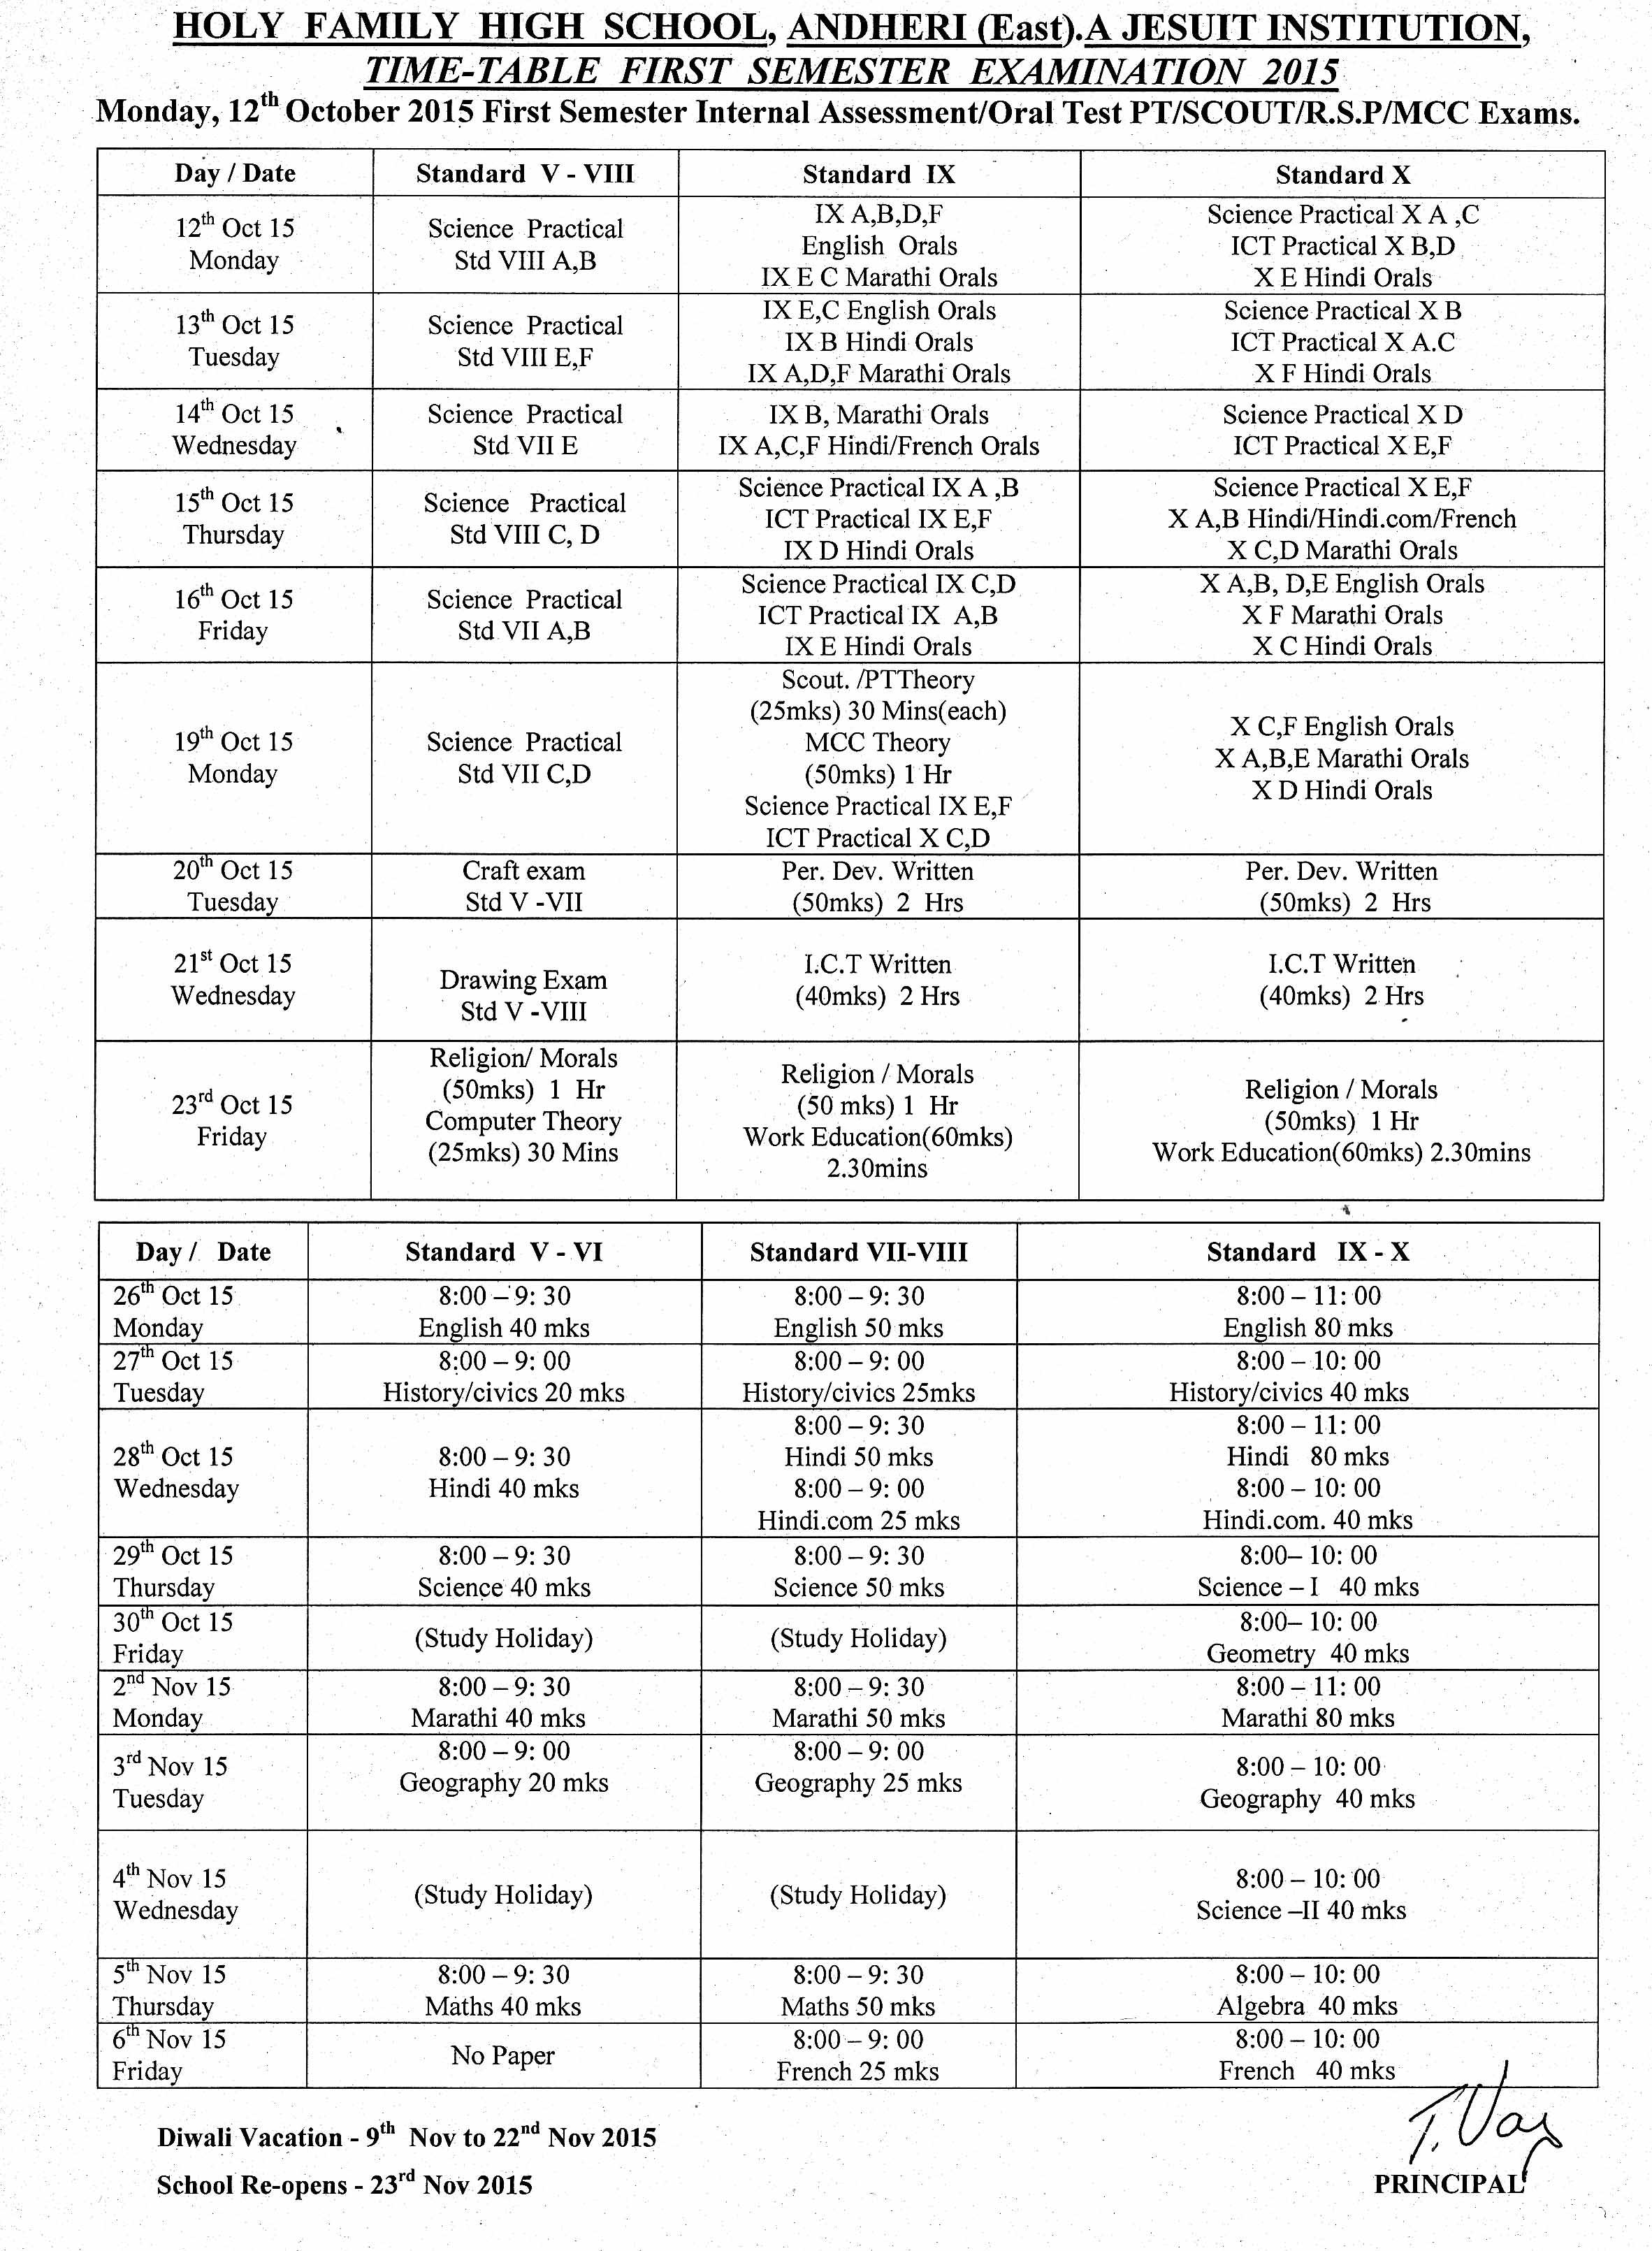 Time table october 2015 holy family high school jr for Tekerala org time table 2015